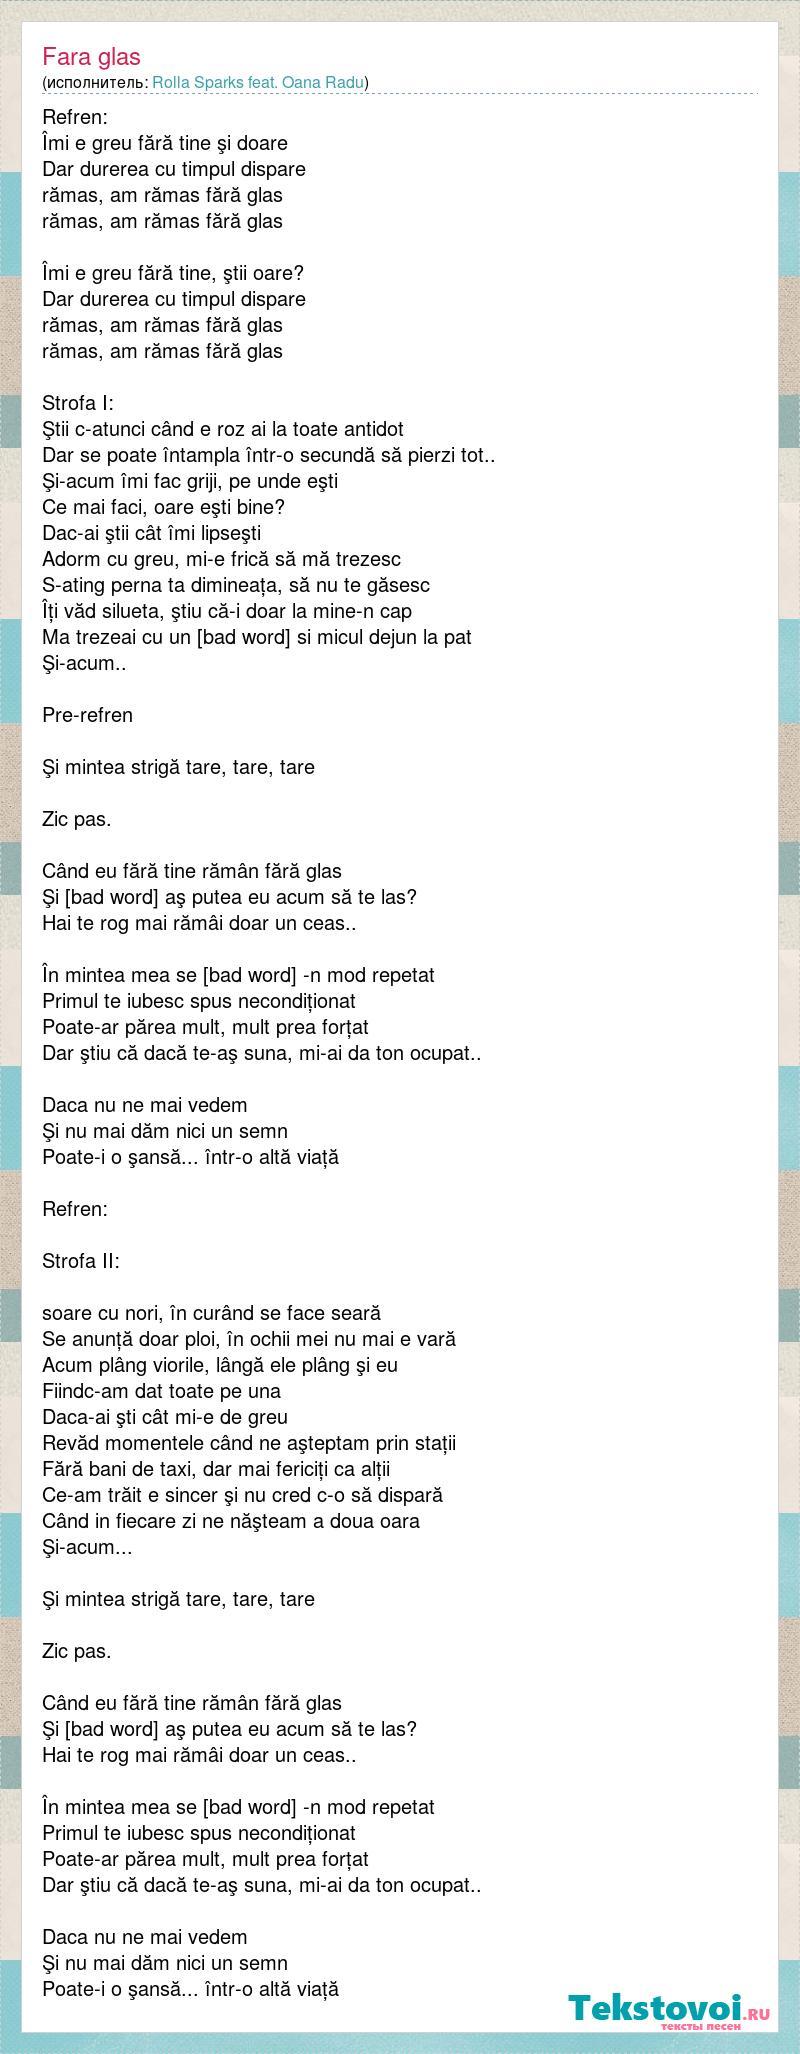 Rolla Sparks feat  Oana Radu: Fara glas слова песни